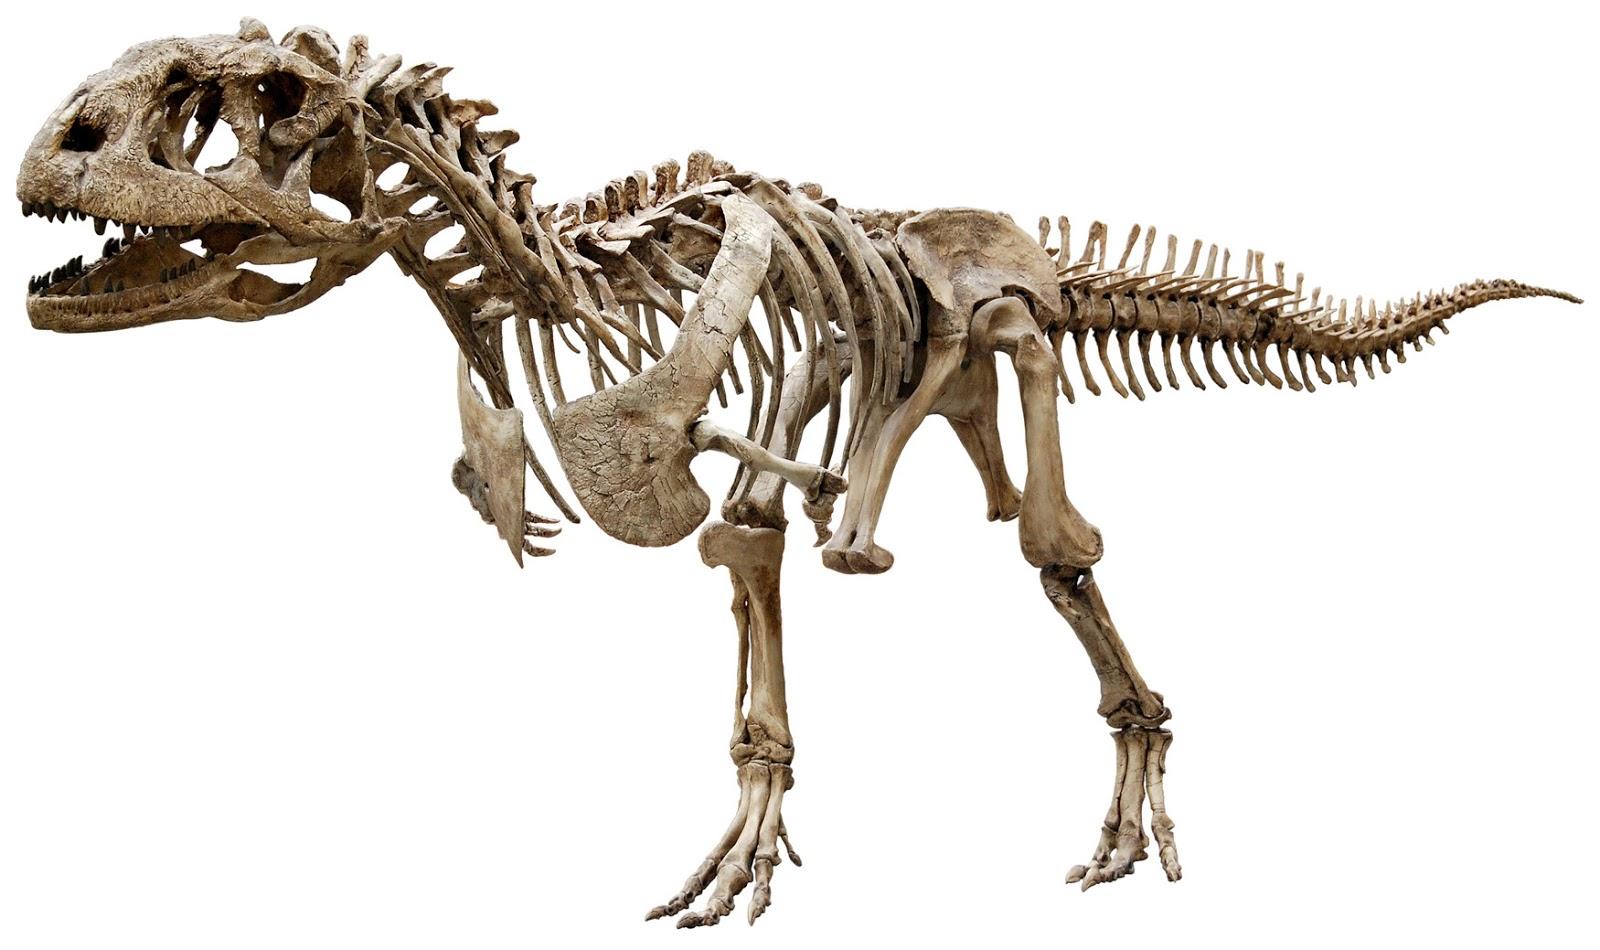 1600 x 950 jpeg 212kBVastatosaurus